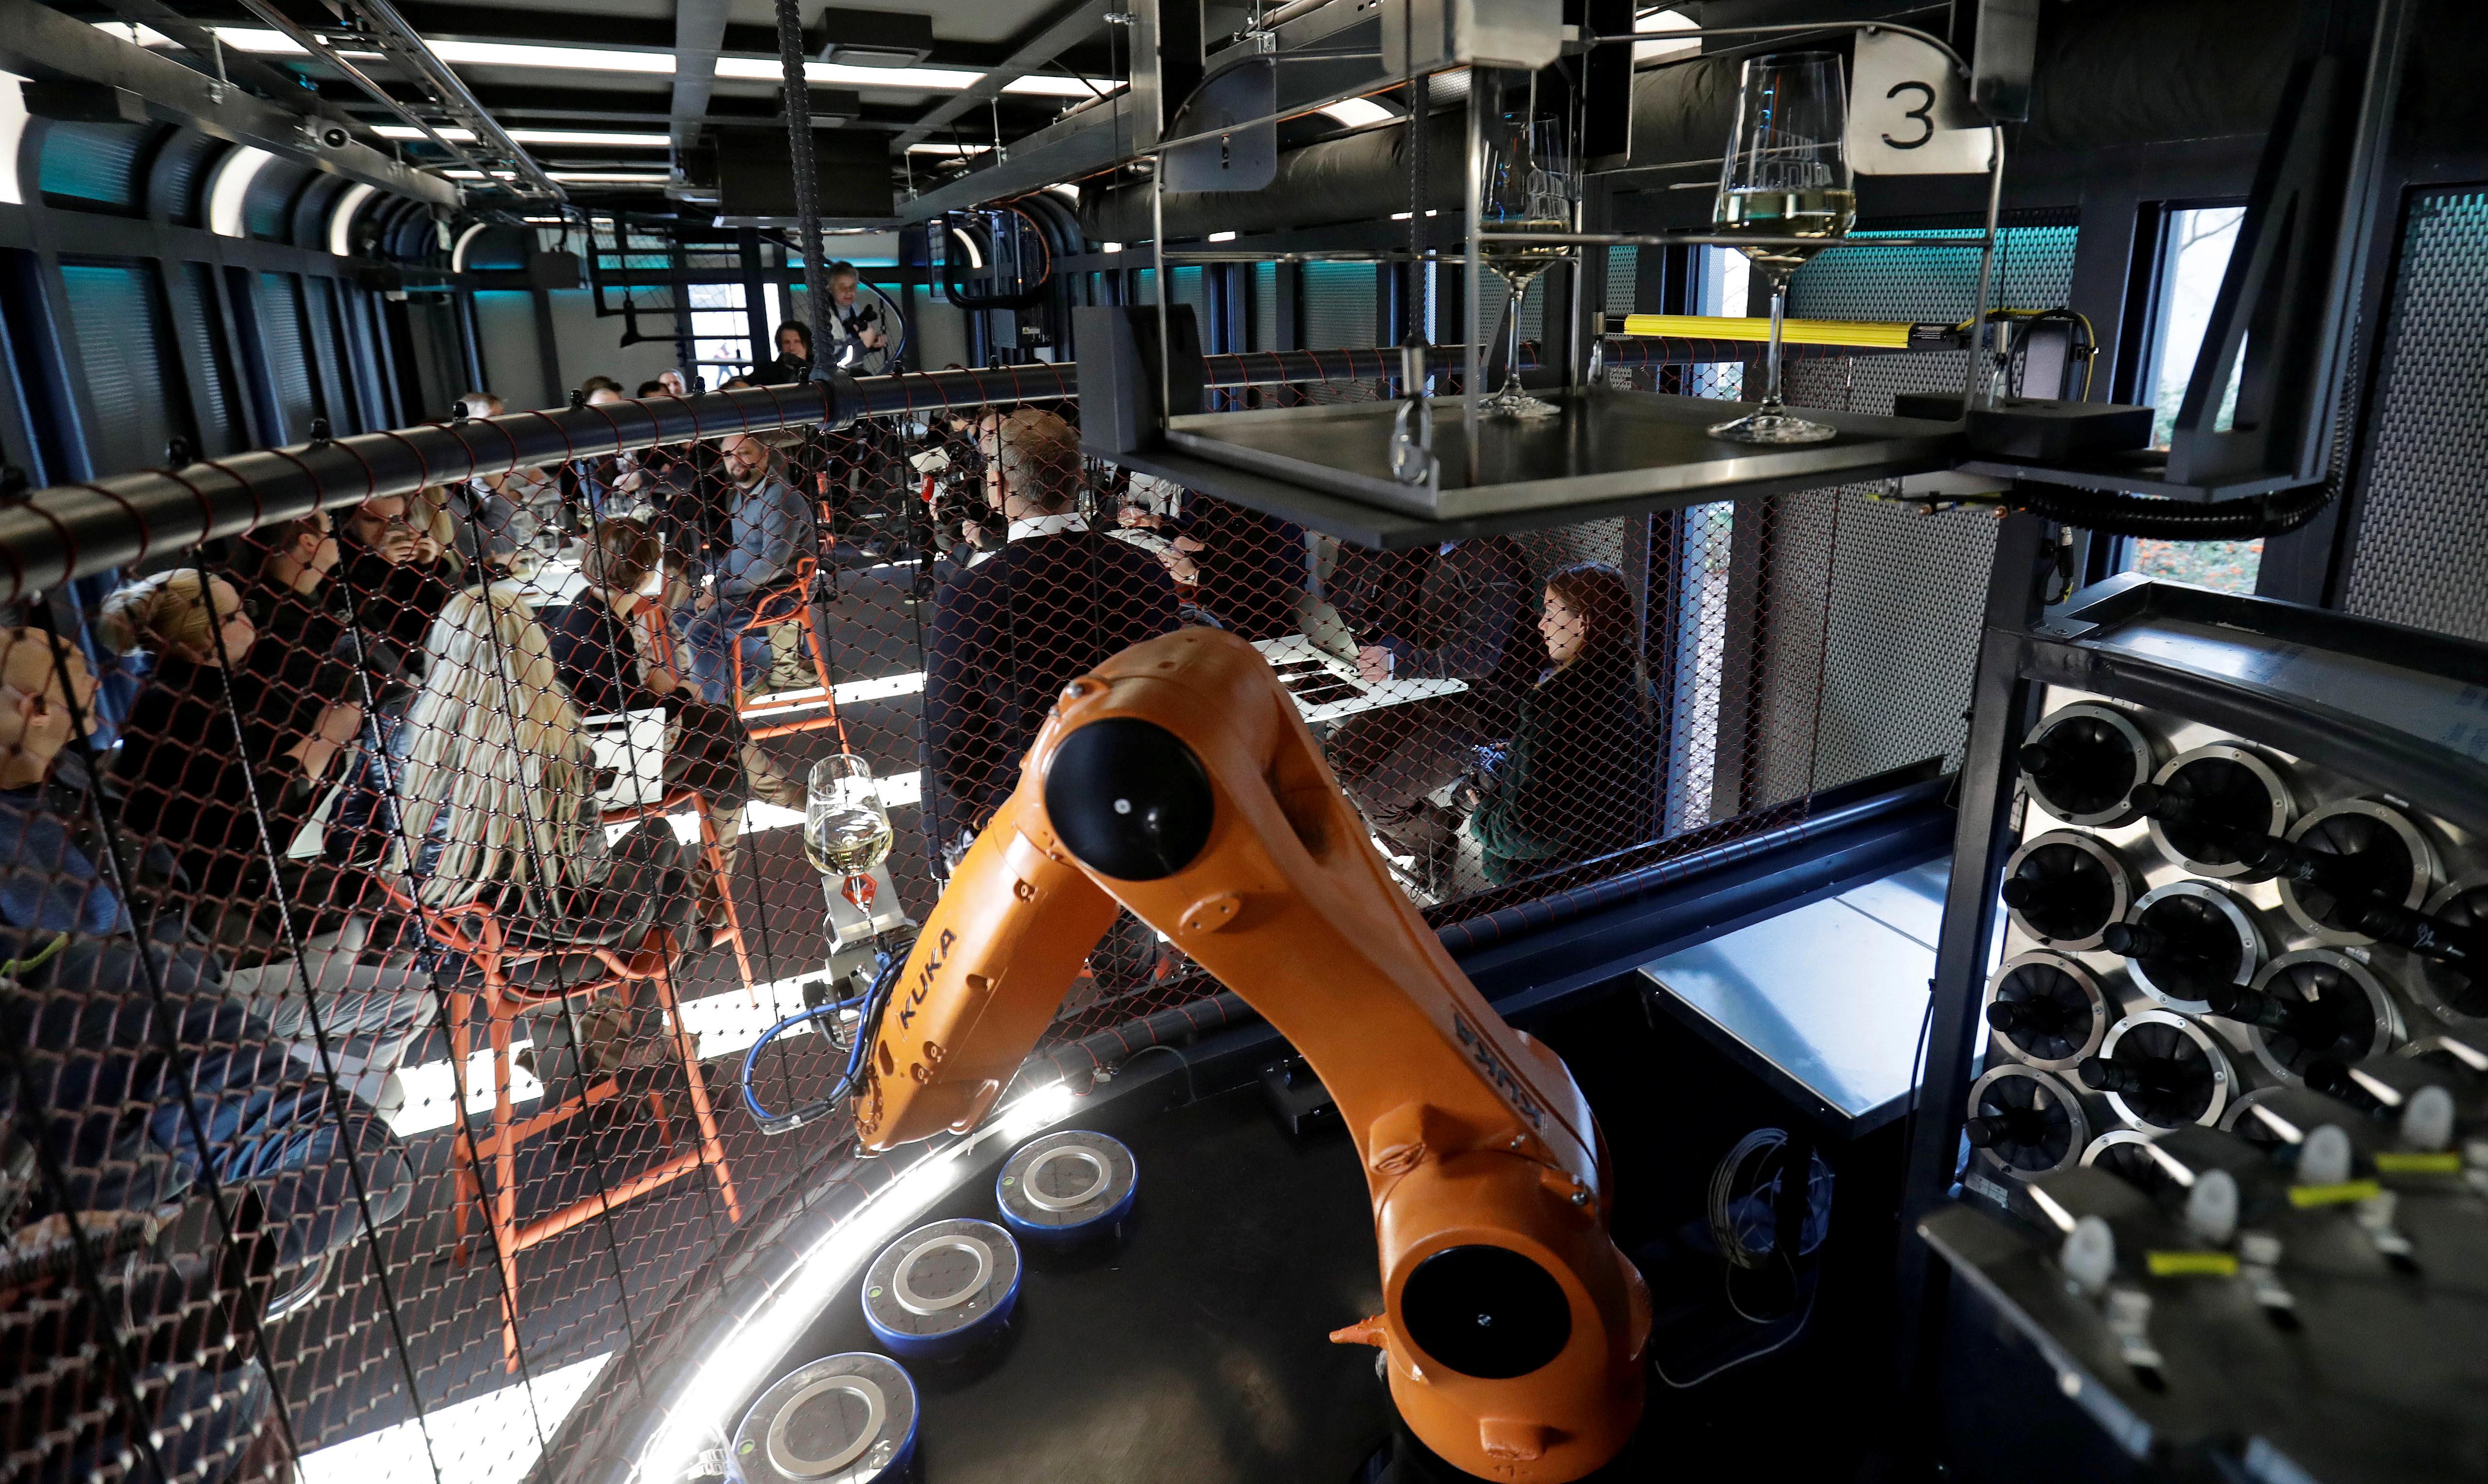 FILE PHOTO: A robotic bartender prepares drinks inside a space modul-like structure in Prague, Czech Republic, November 28, 2018. REUTERS/David W Cerny/File Photo